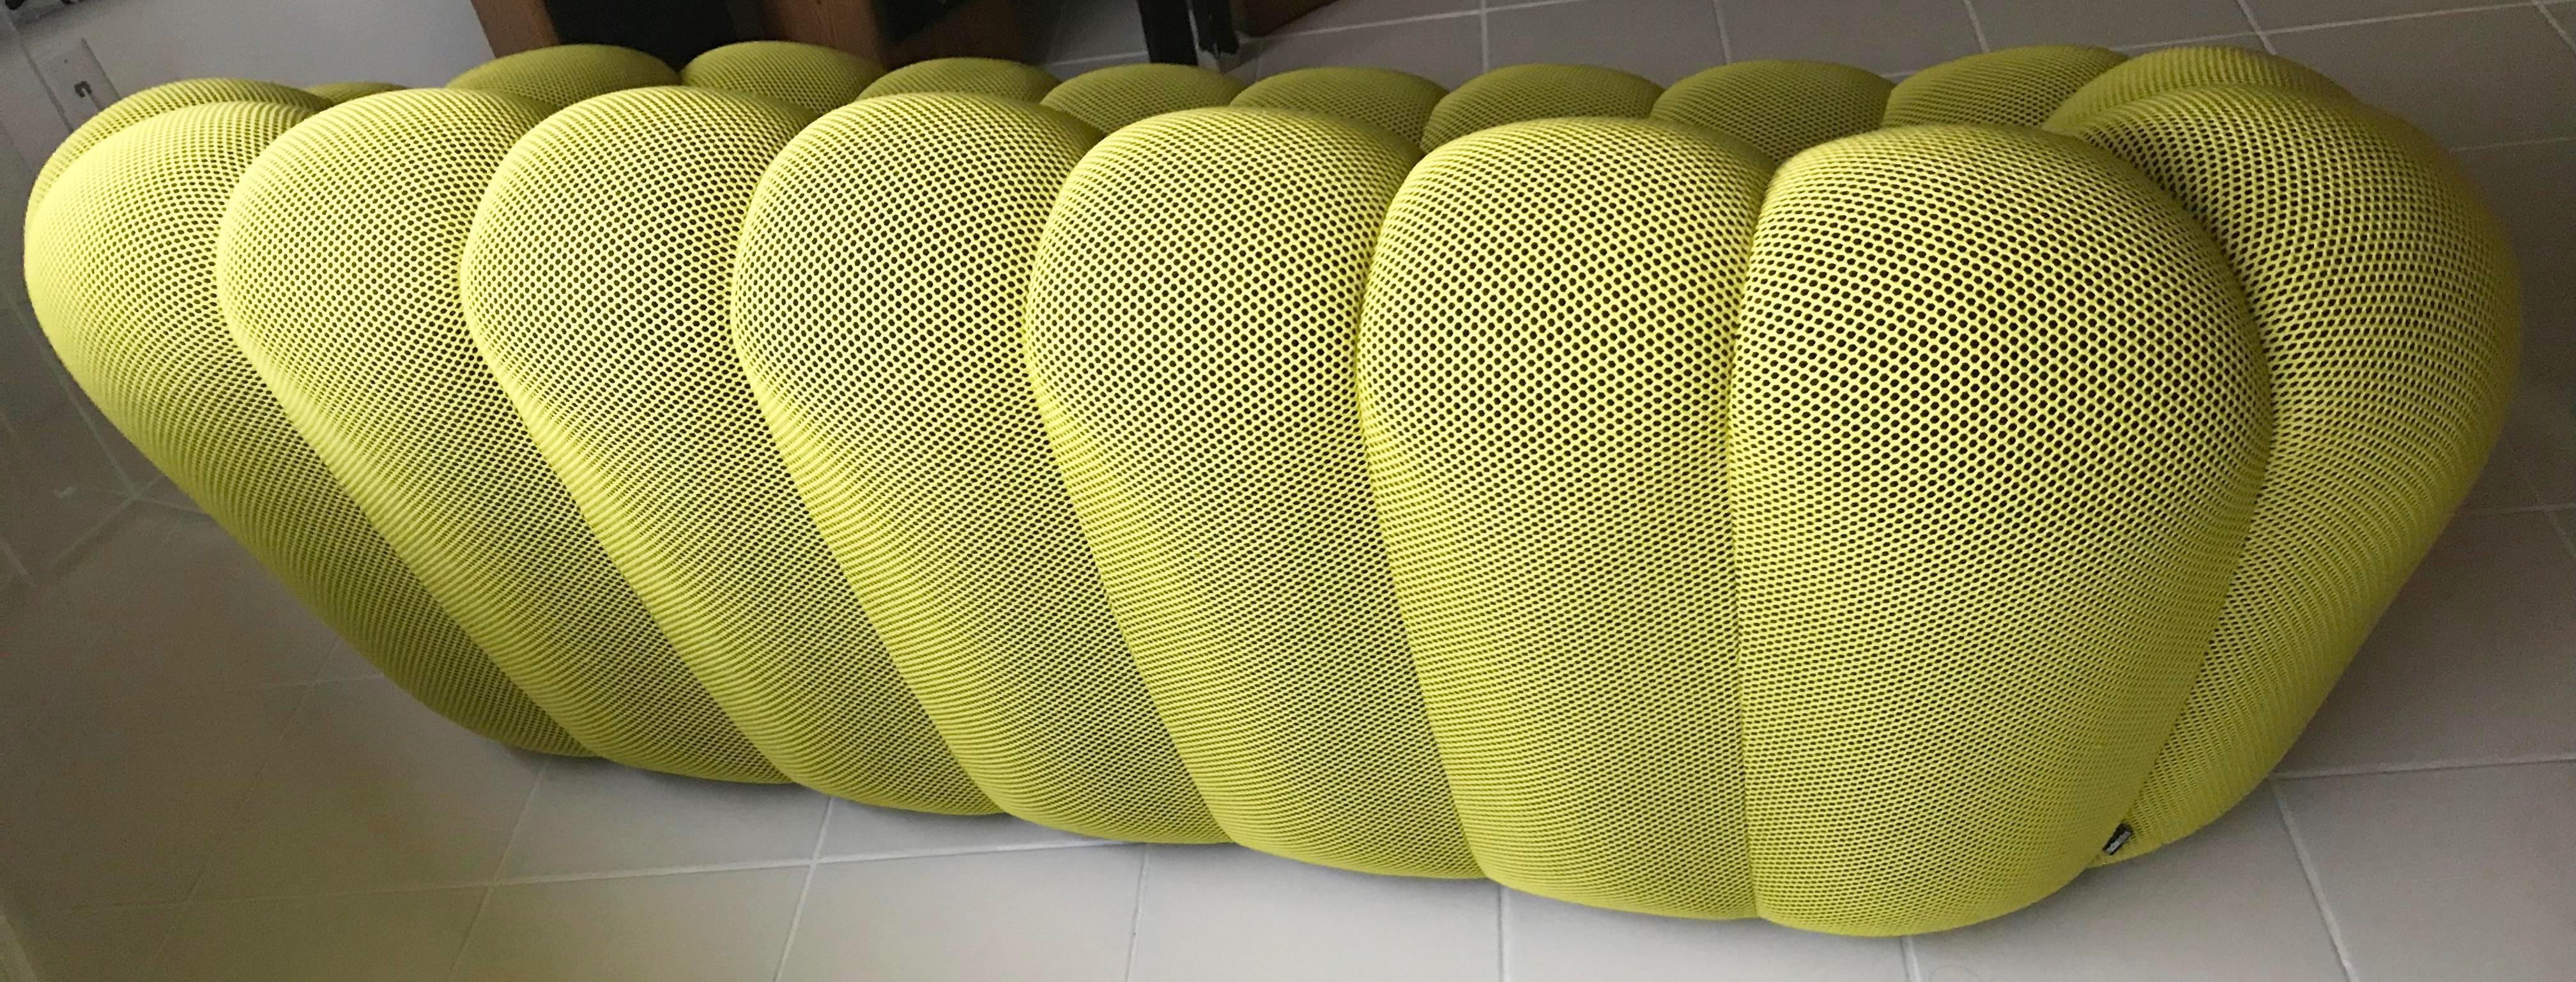 Bubble Sofa By Sacha Lakic For Roche Bobois   Image 2 Of 6